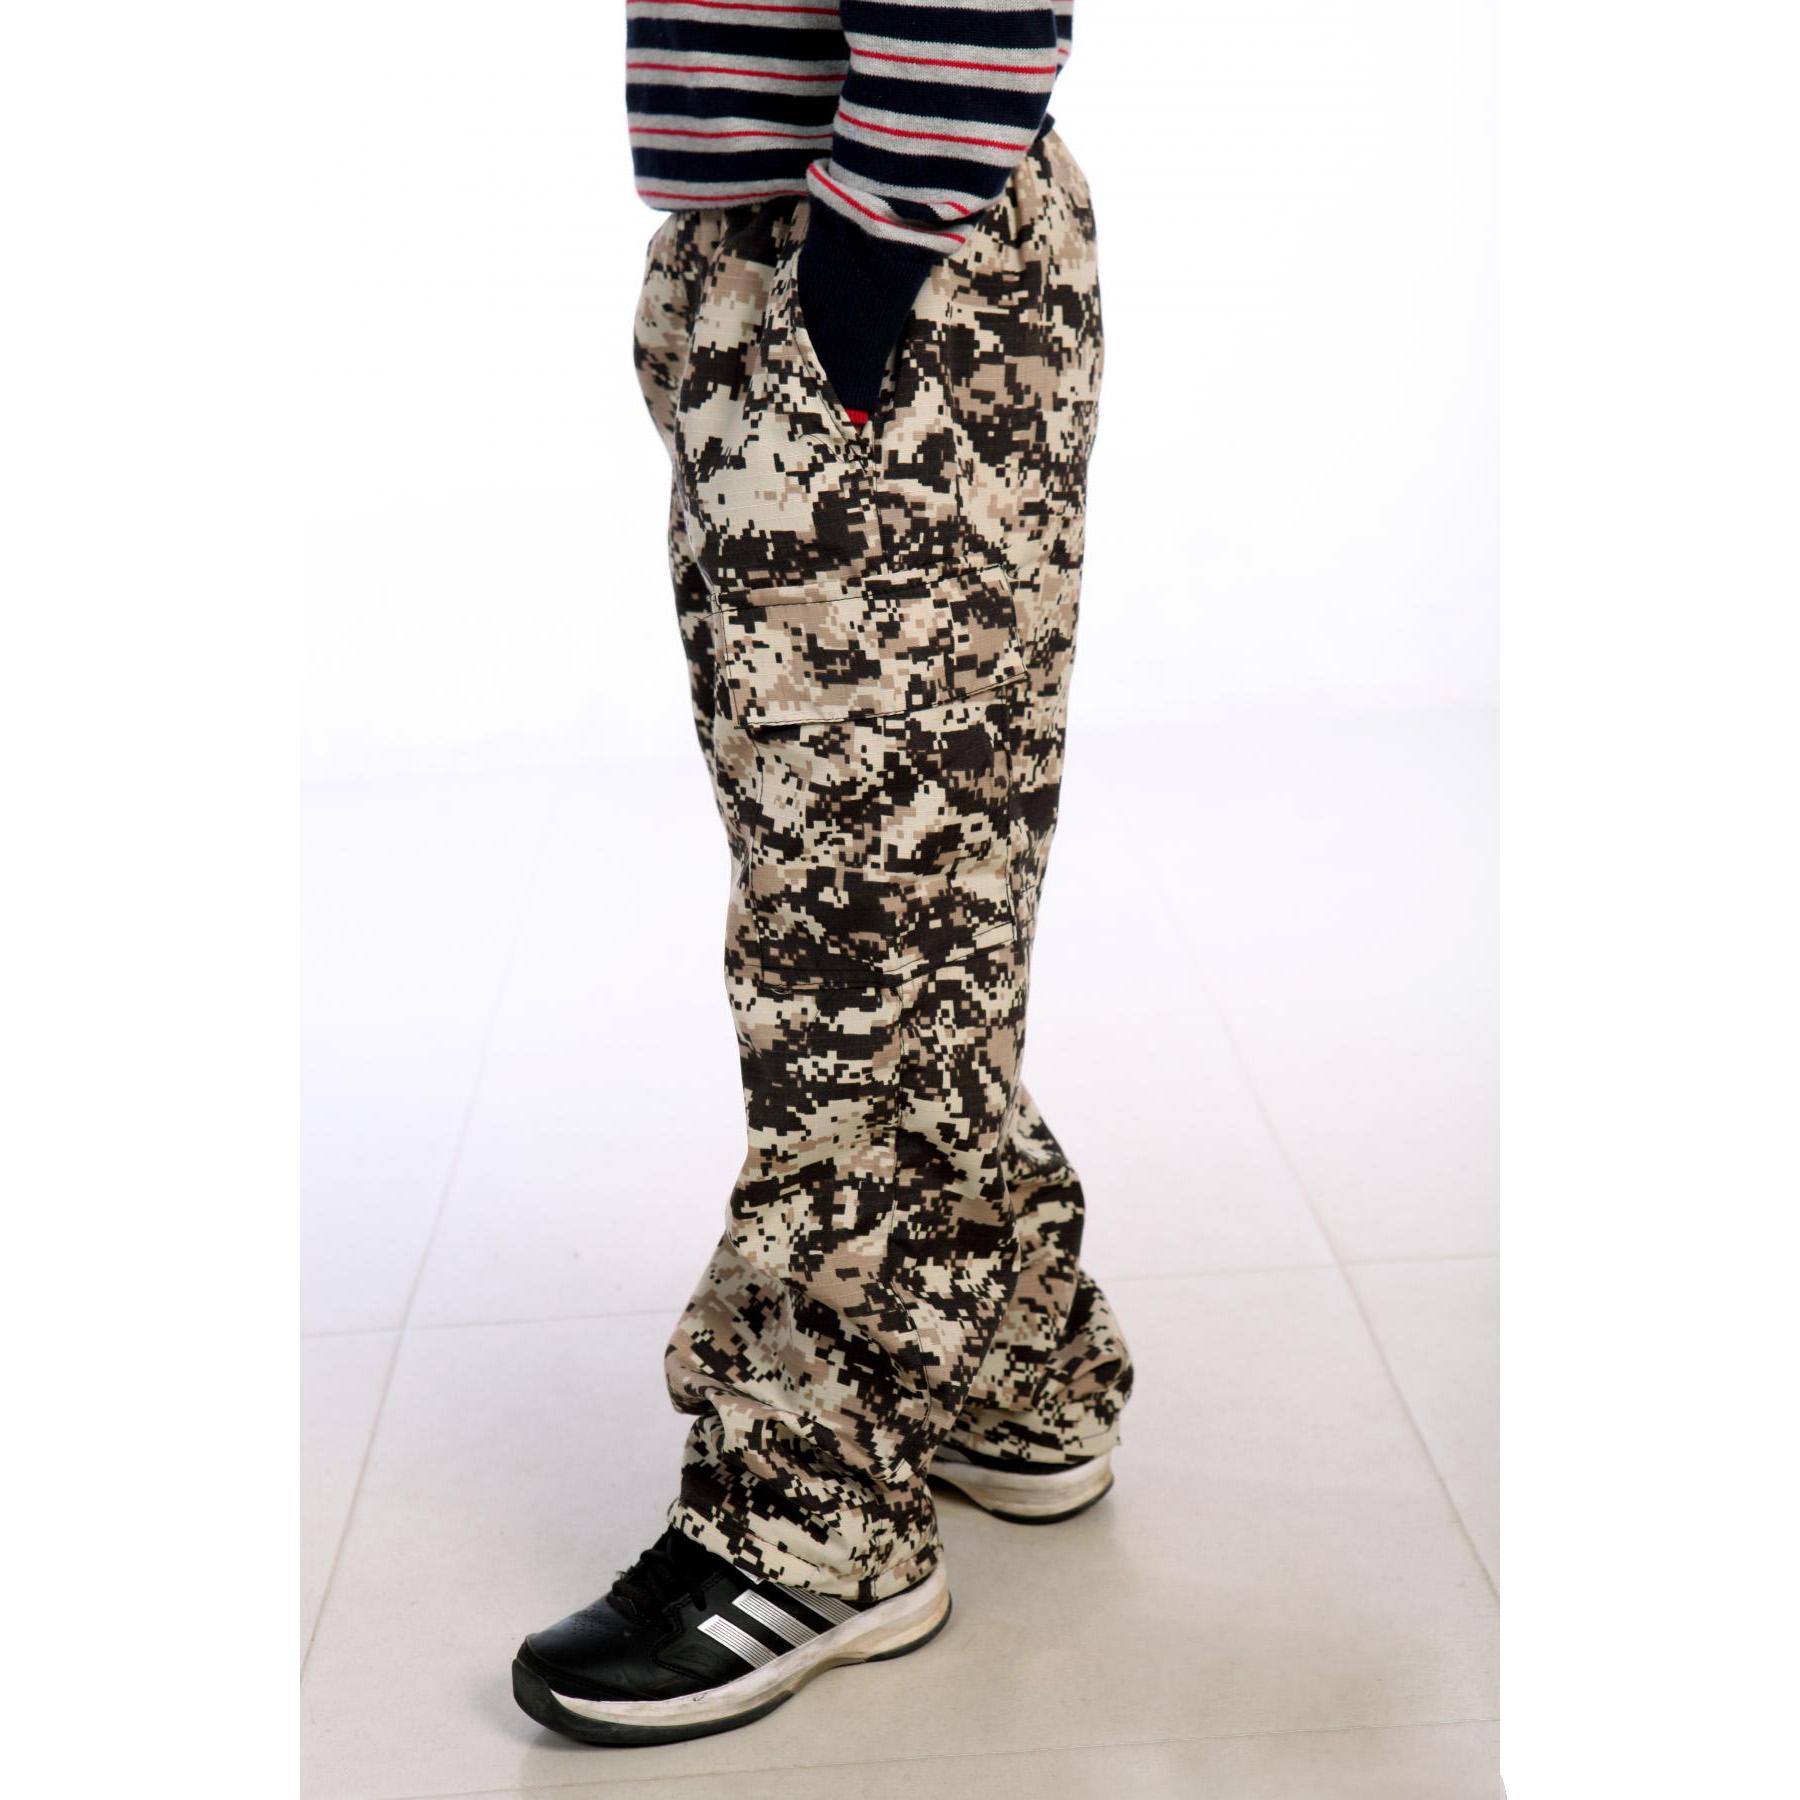 Детские брюки Юниор, размер 32Шорты, бриджи, брюки<br><br><br>Тип: Дет. брюки<br>Размер: 32<br>Материал: Рип-стоп